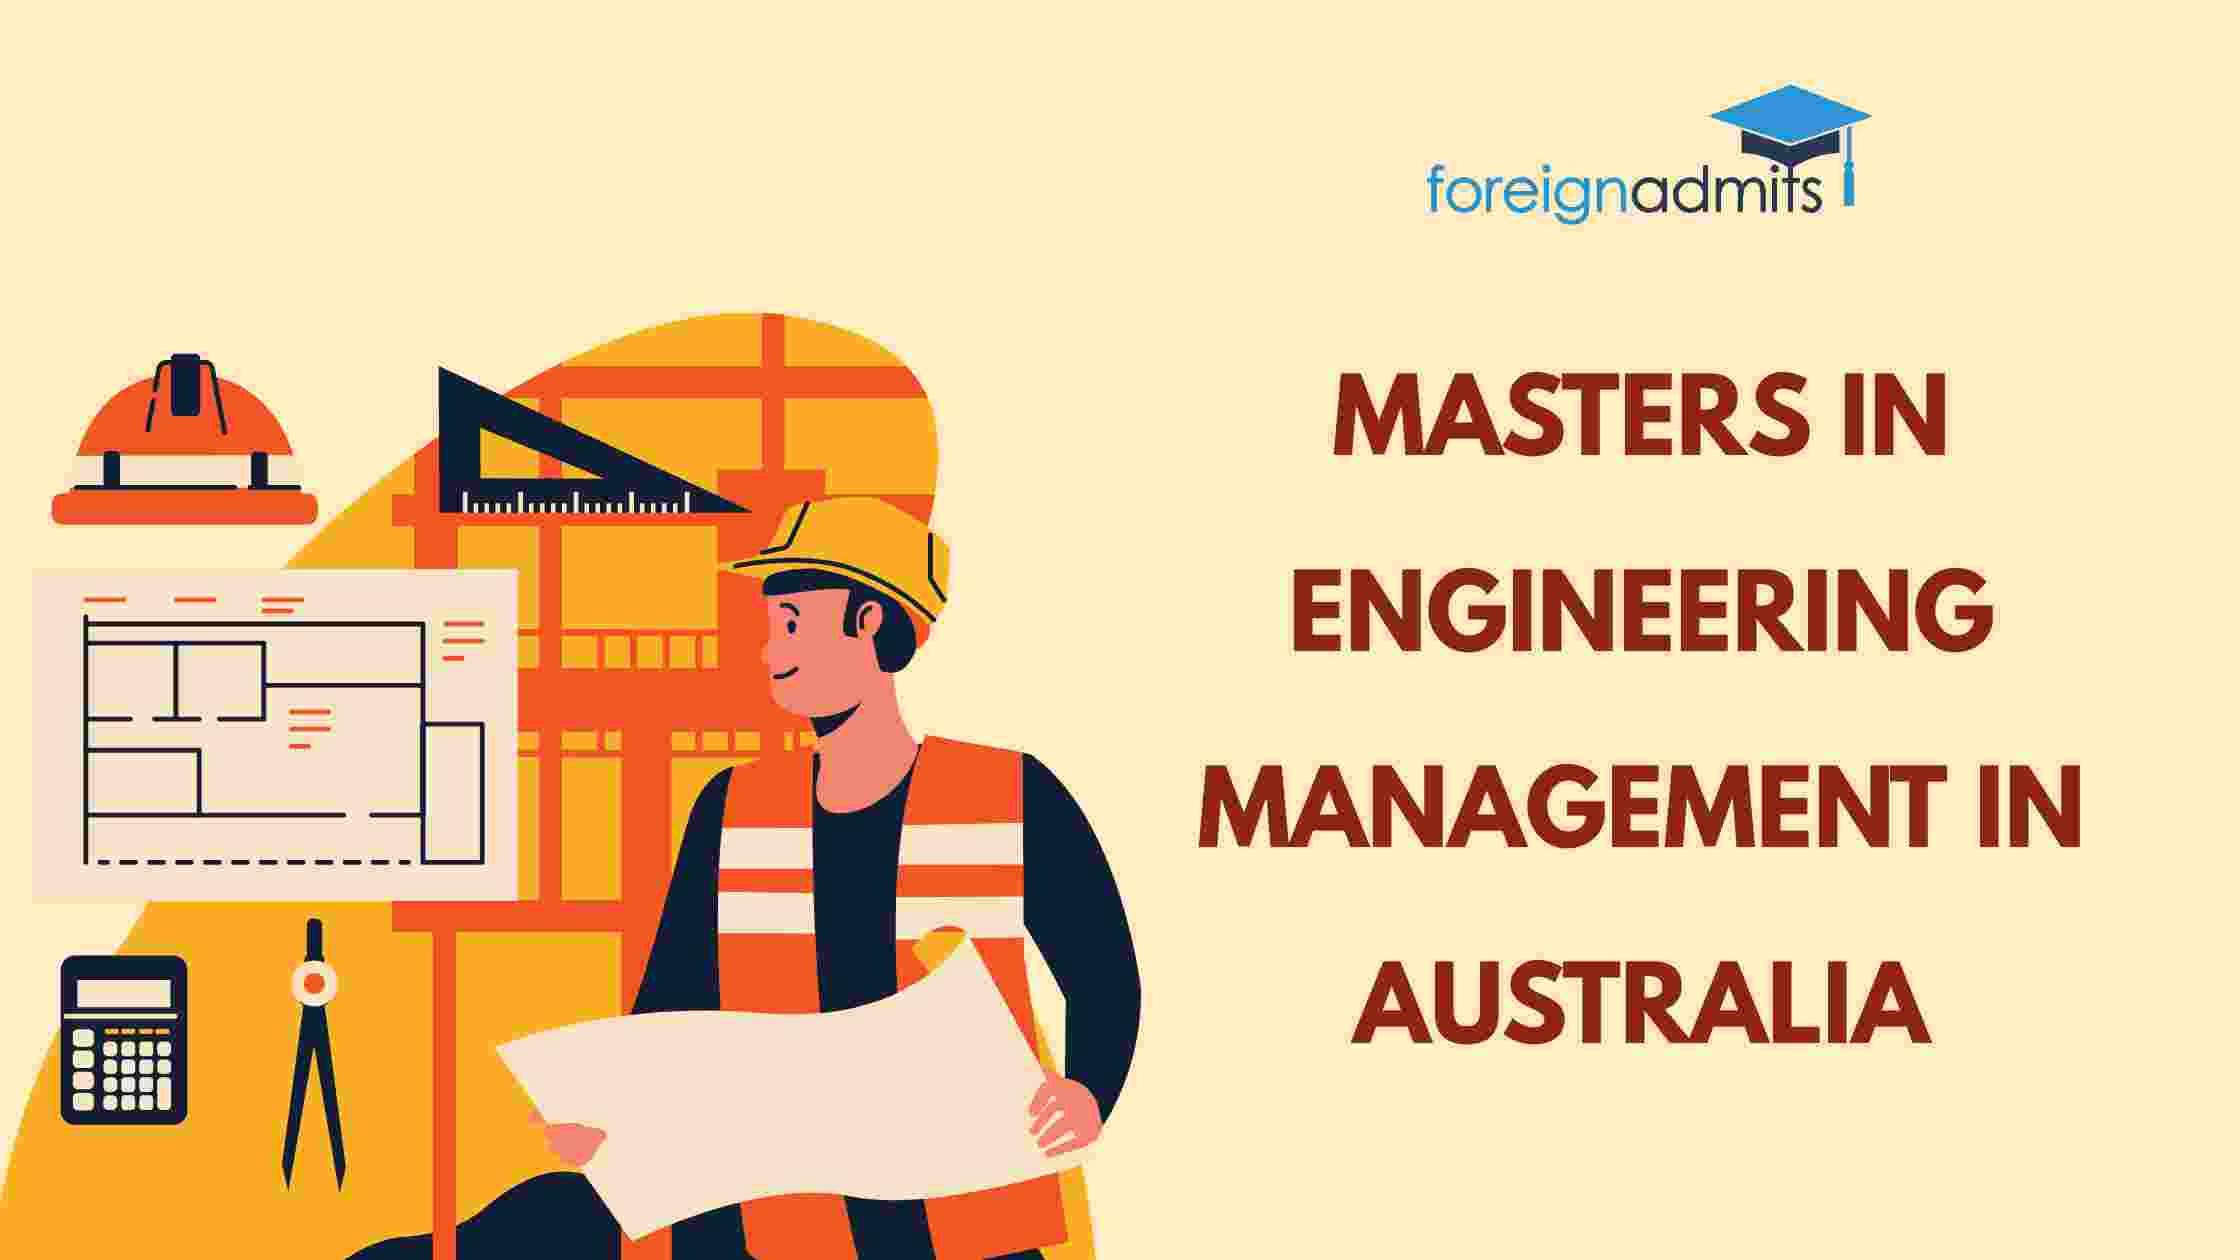 Masters in Engineering Management in Australia